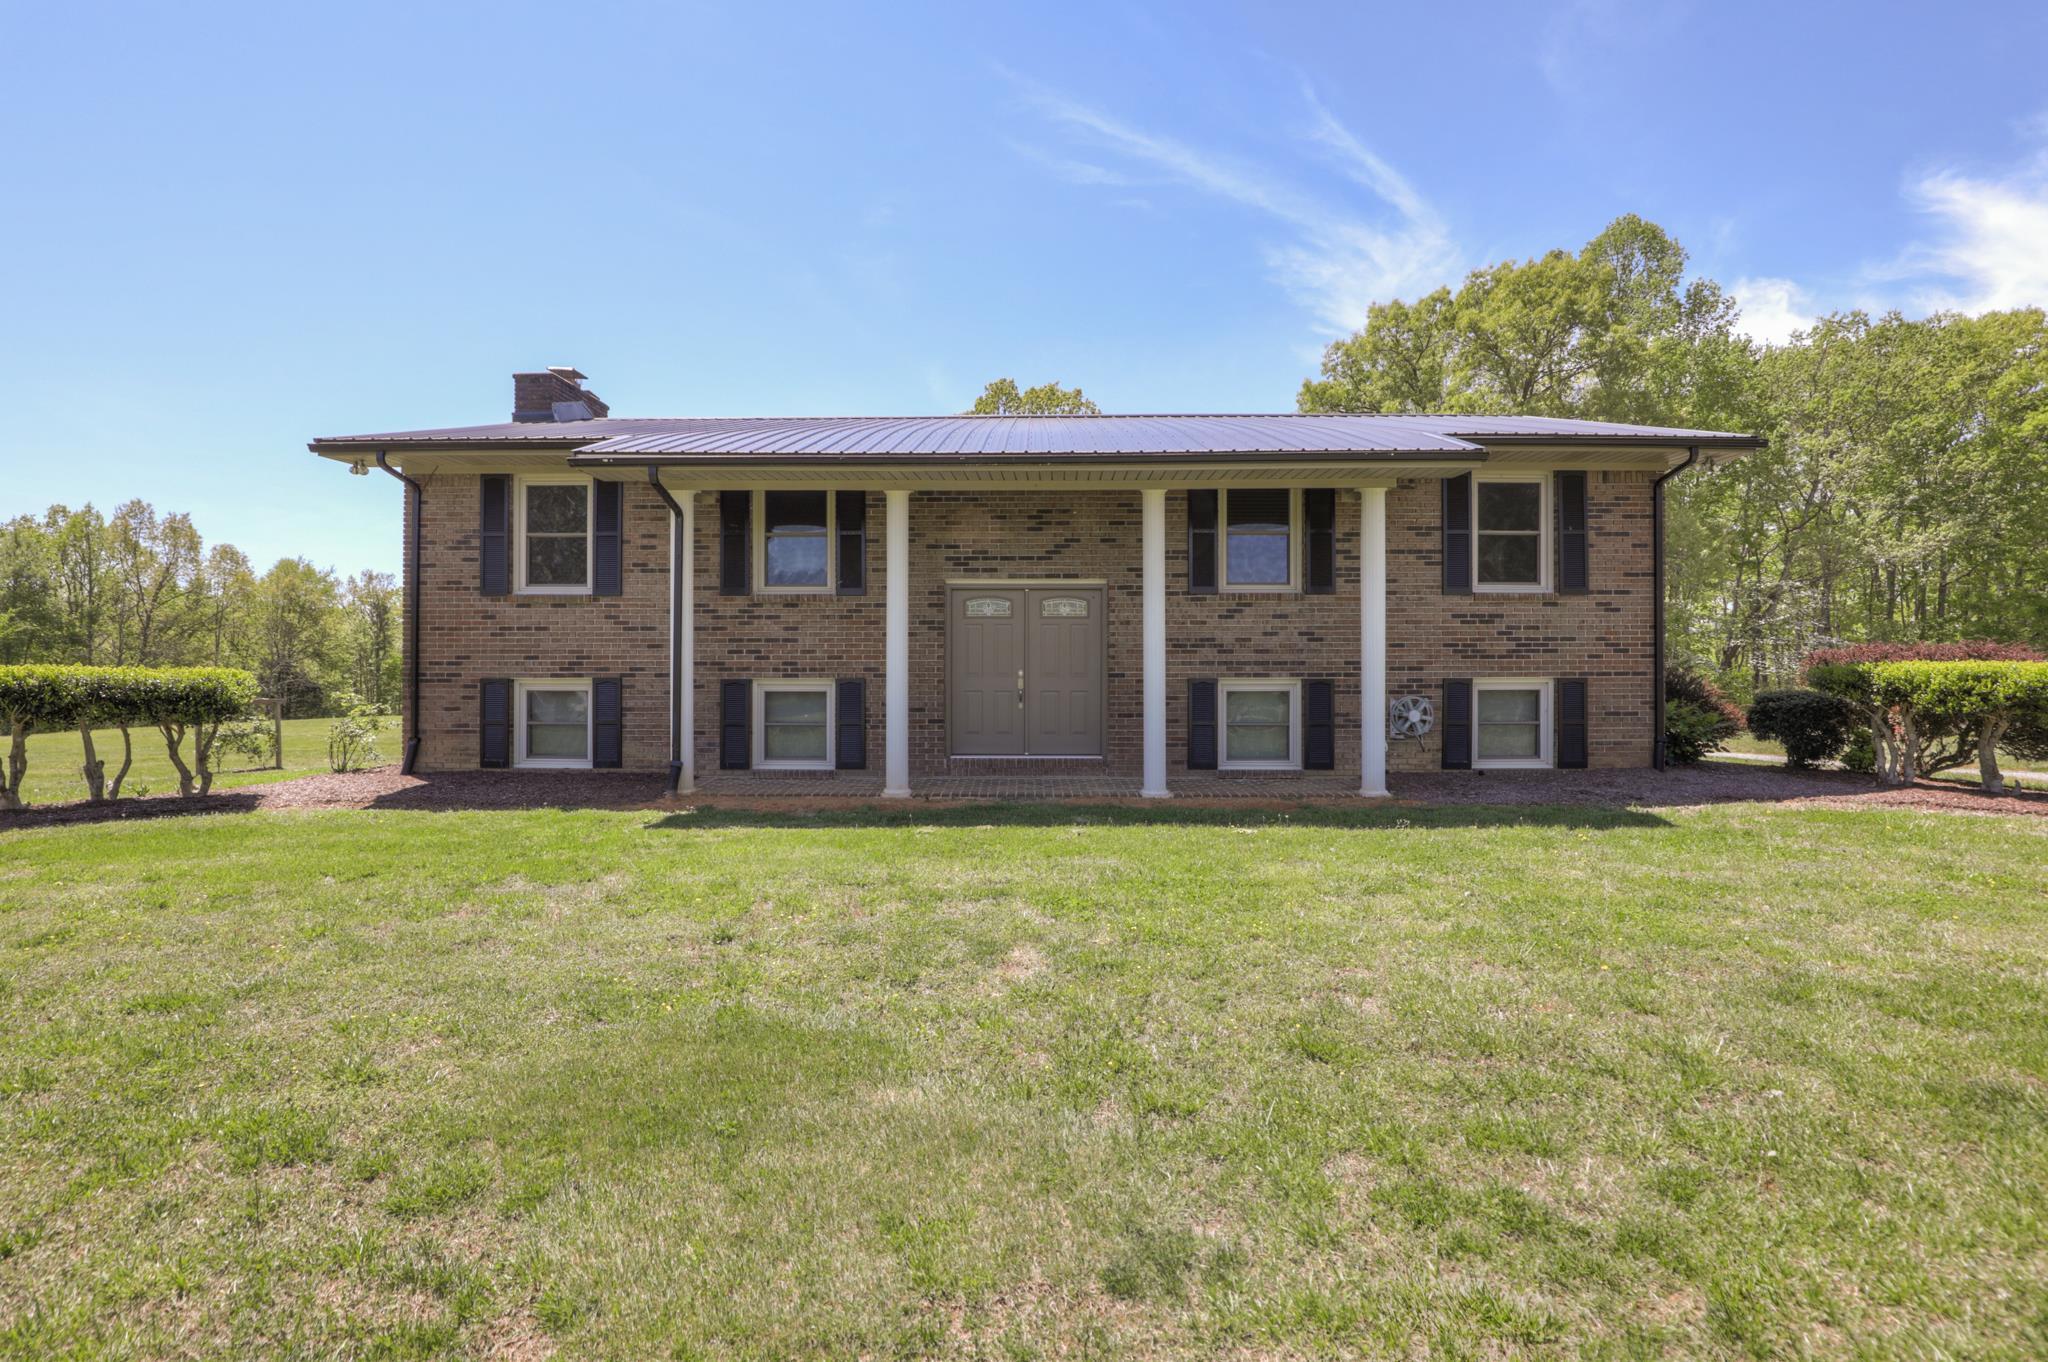 313 Rolling Acres Rd, Smithville, TN 37166 - Smithville, TN real estate listing